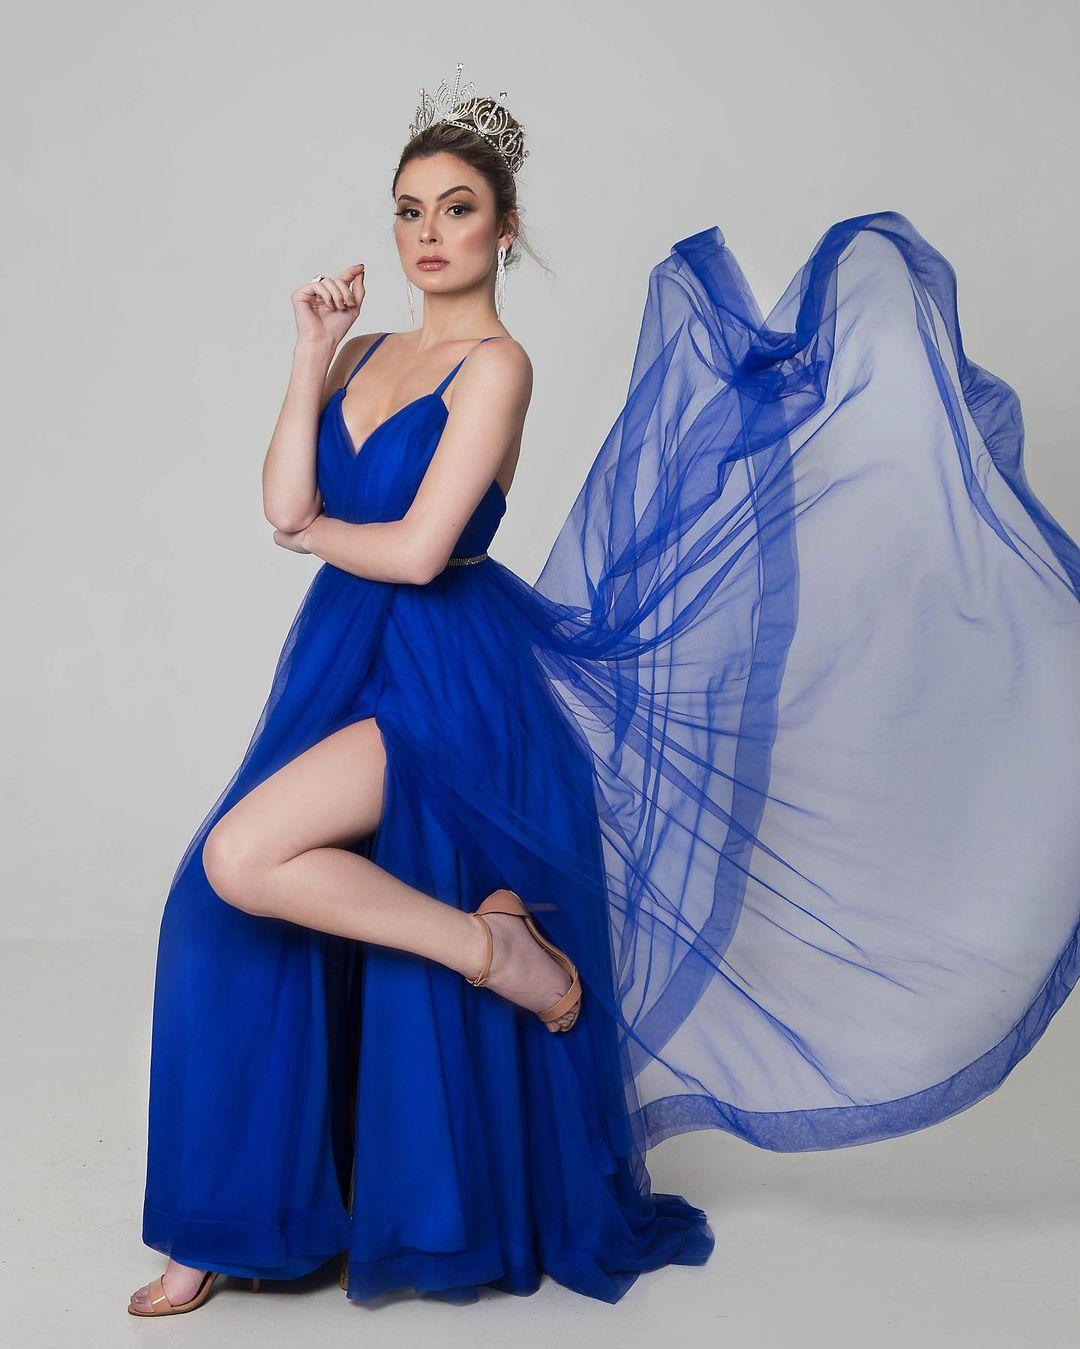 thais bonome, miss beleza da grande sao paulo 2020/miss abcd mundo 2019. 12626214